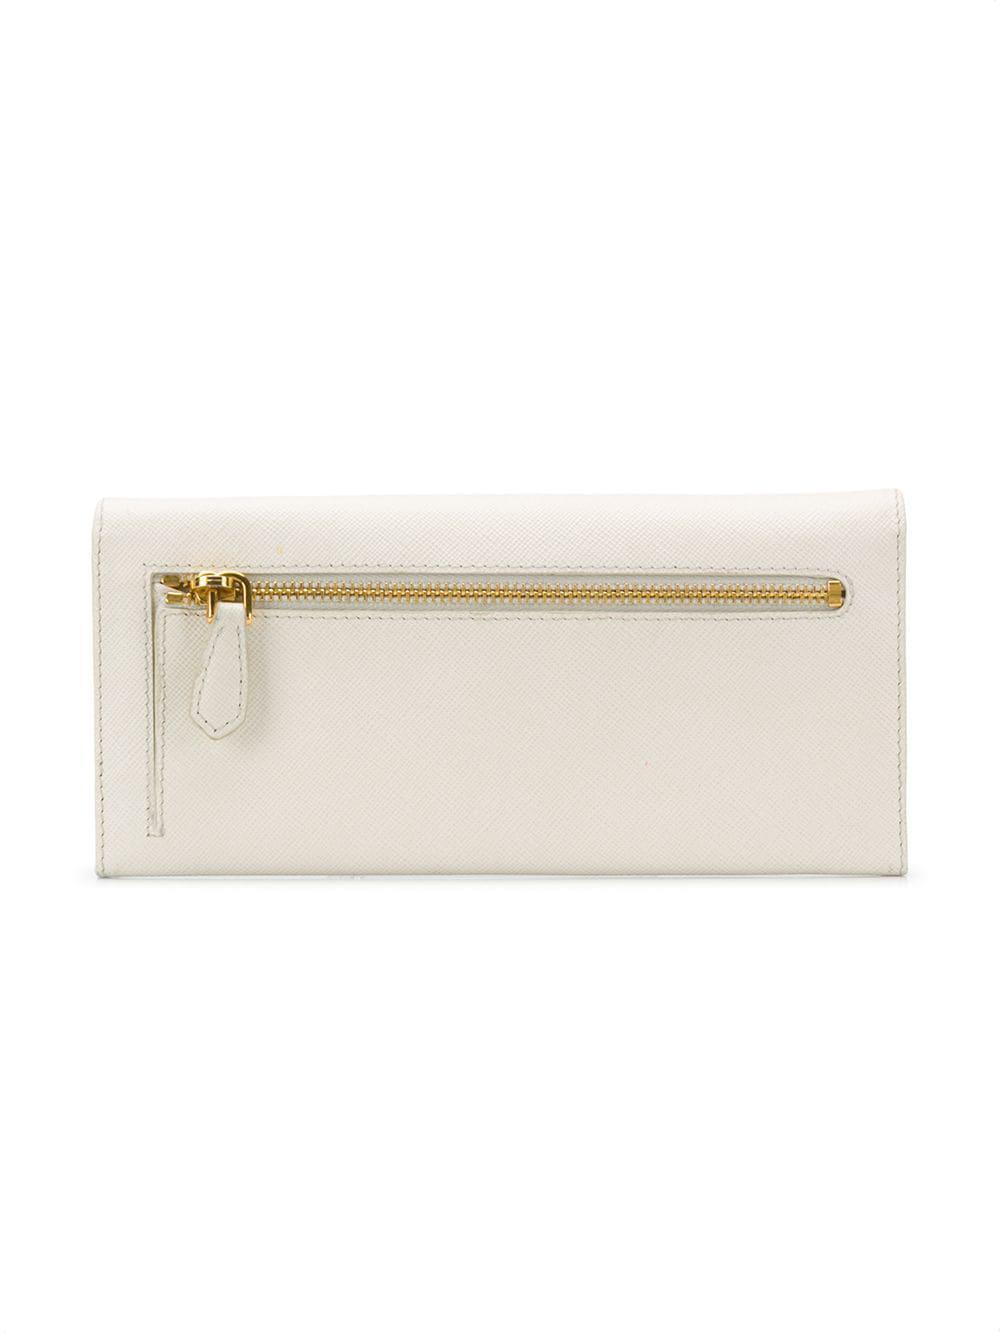 89b3b9b338d9 Lyst - Prada Flap Saffiano Continental Wallet in White